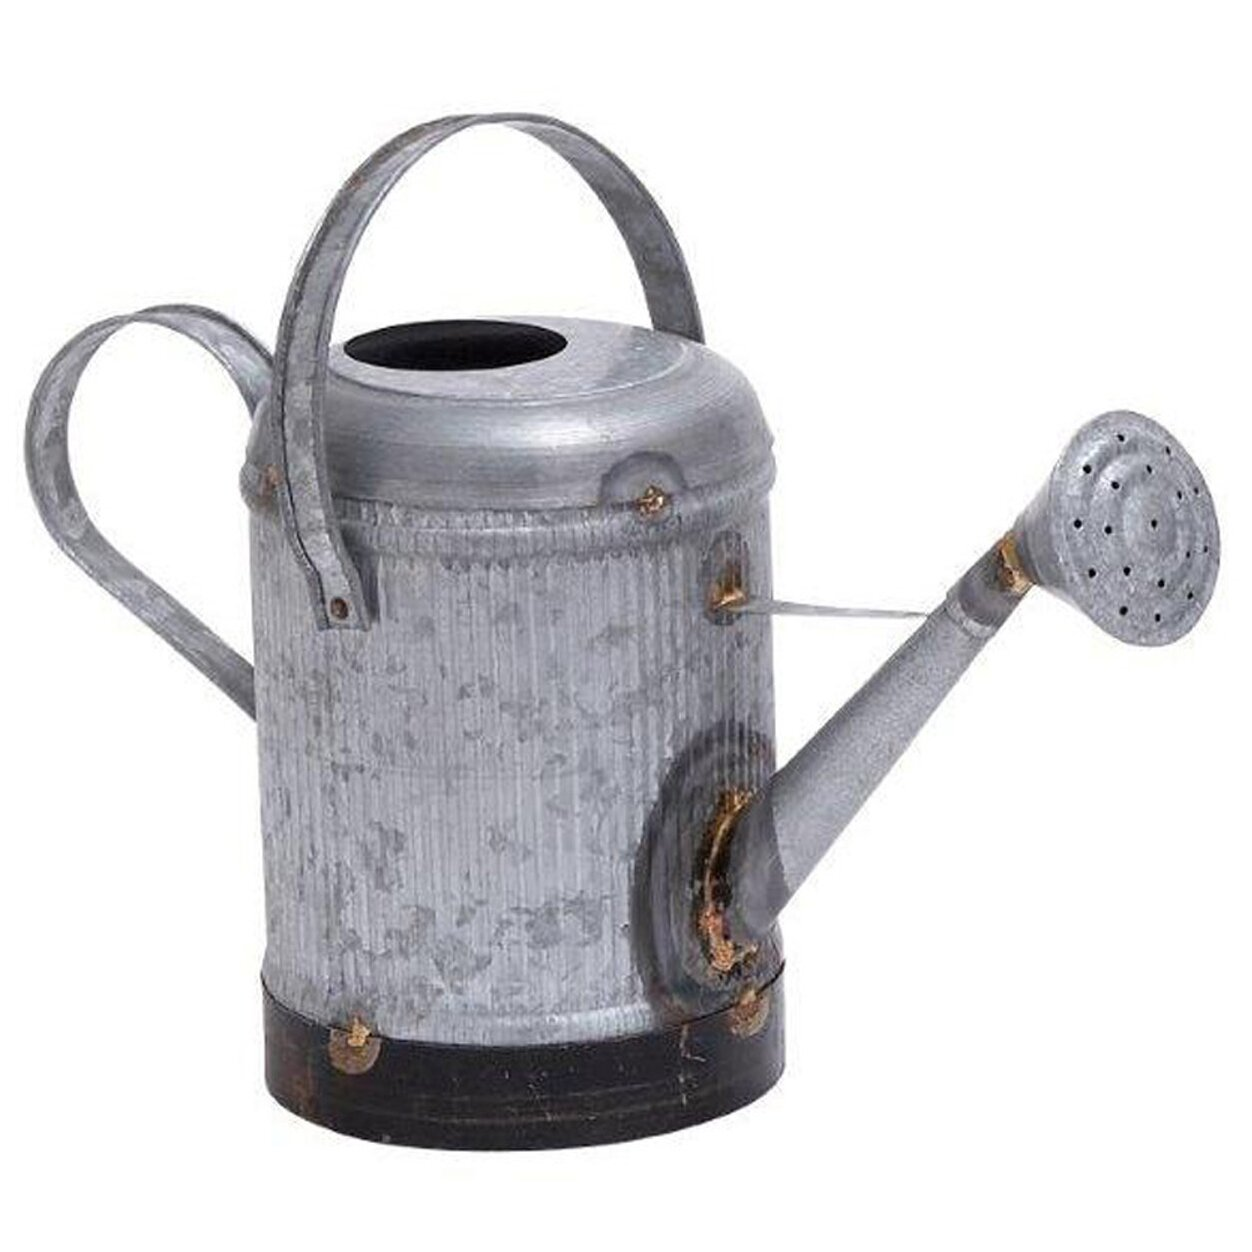 Ore furniture metal 1 gallon ridge water can reviews wayfair - Gallon metal watering can ...